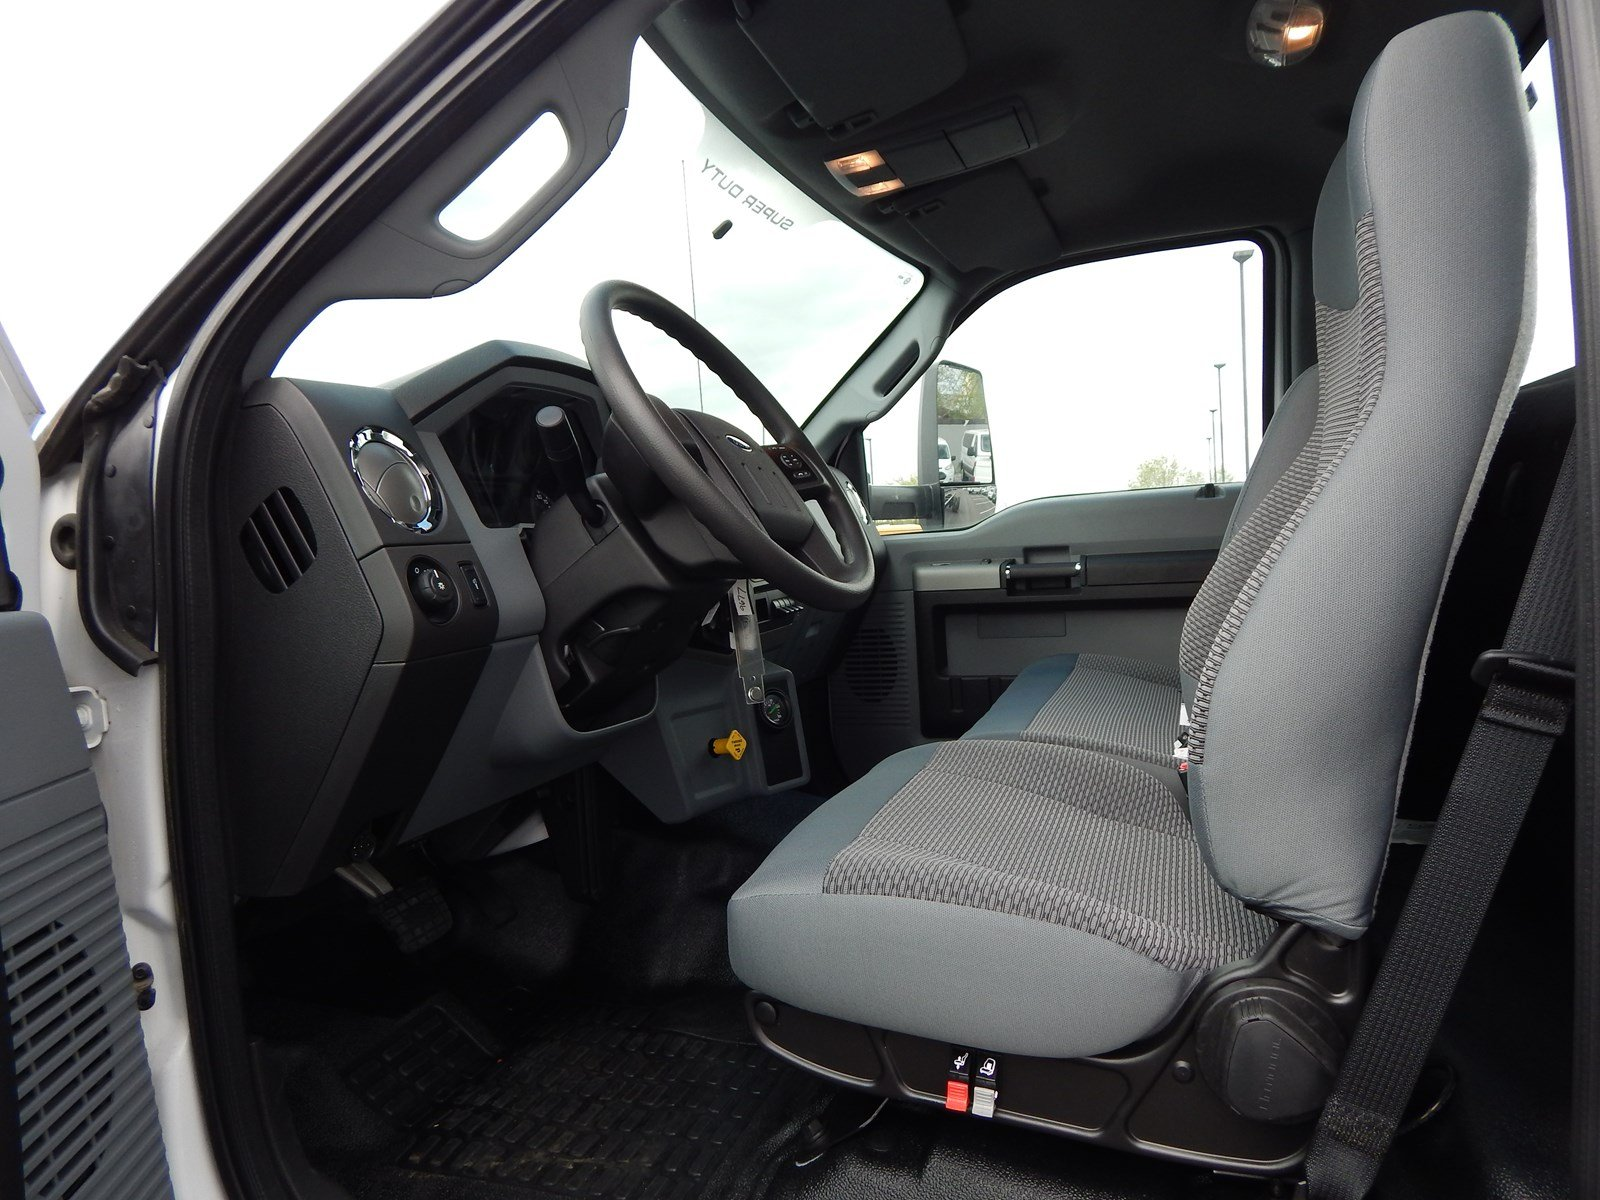 2017 F-750 Regular Cab 4x2, Cab Chassis #67380 - photo 6